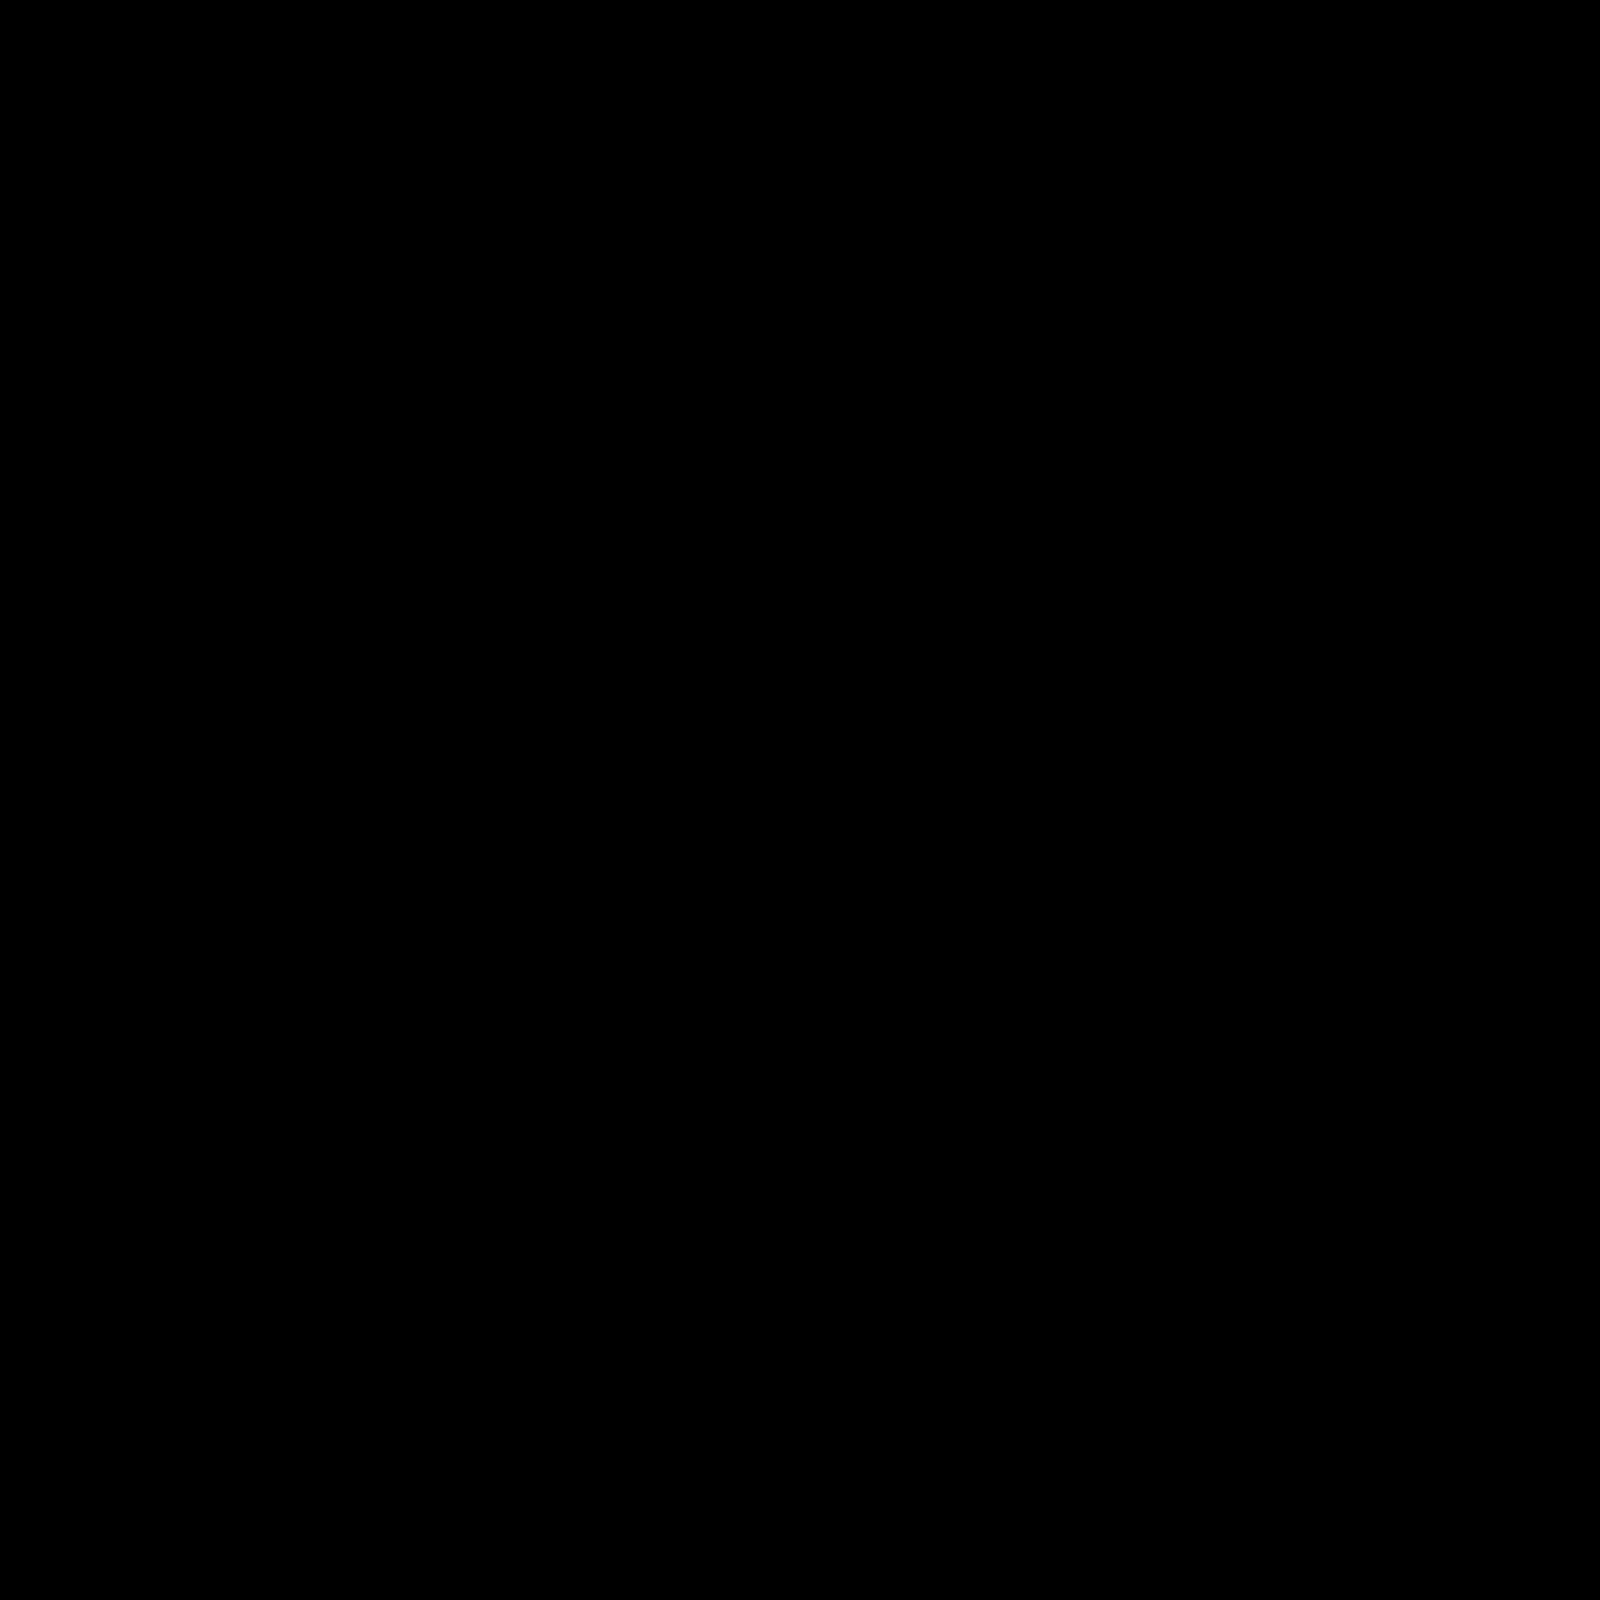 Joe Pineapples Filled icon